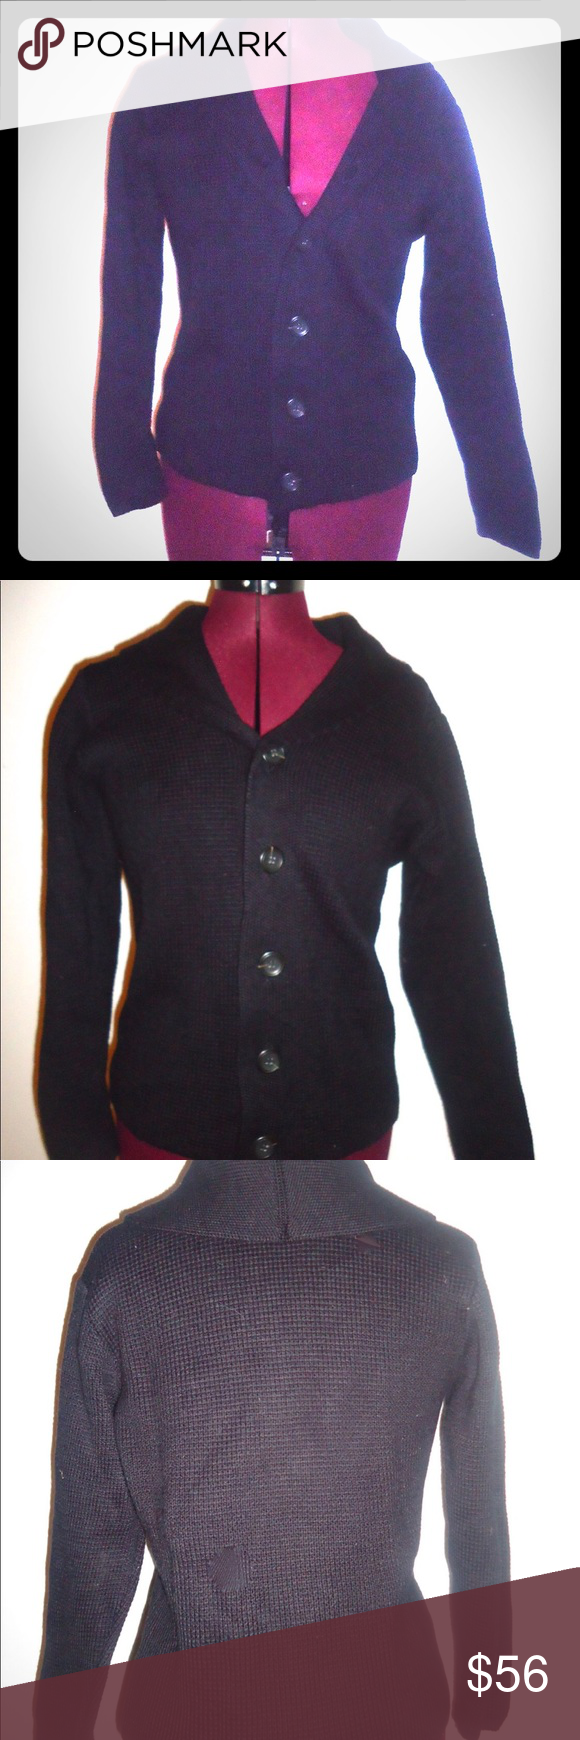 Black Cardigan Sweater Made in Italy Emozioni Uomo Vintage High ...